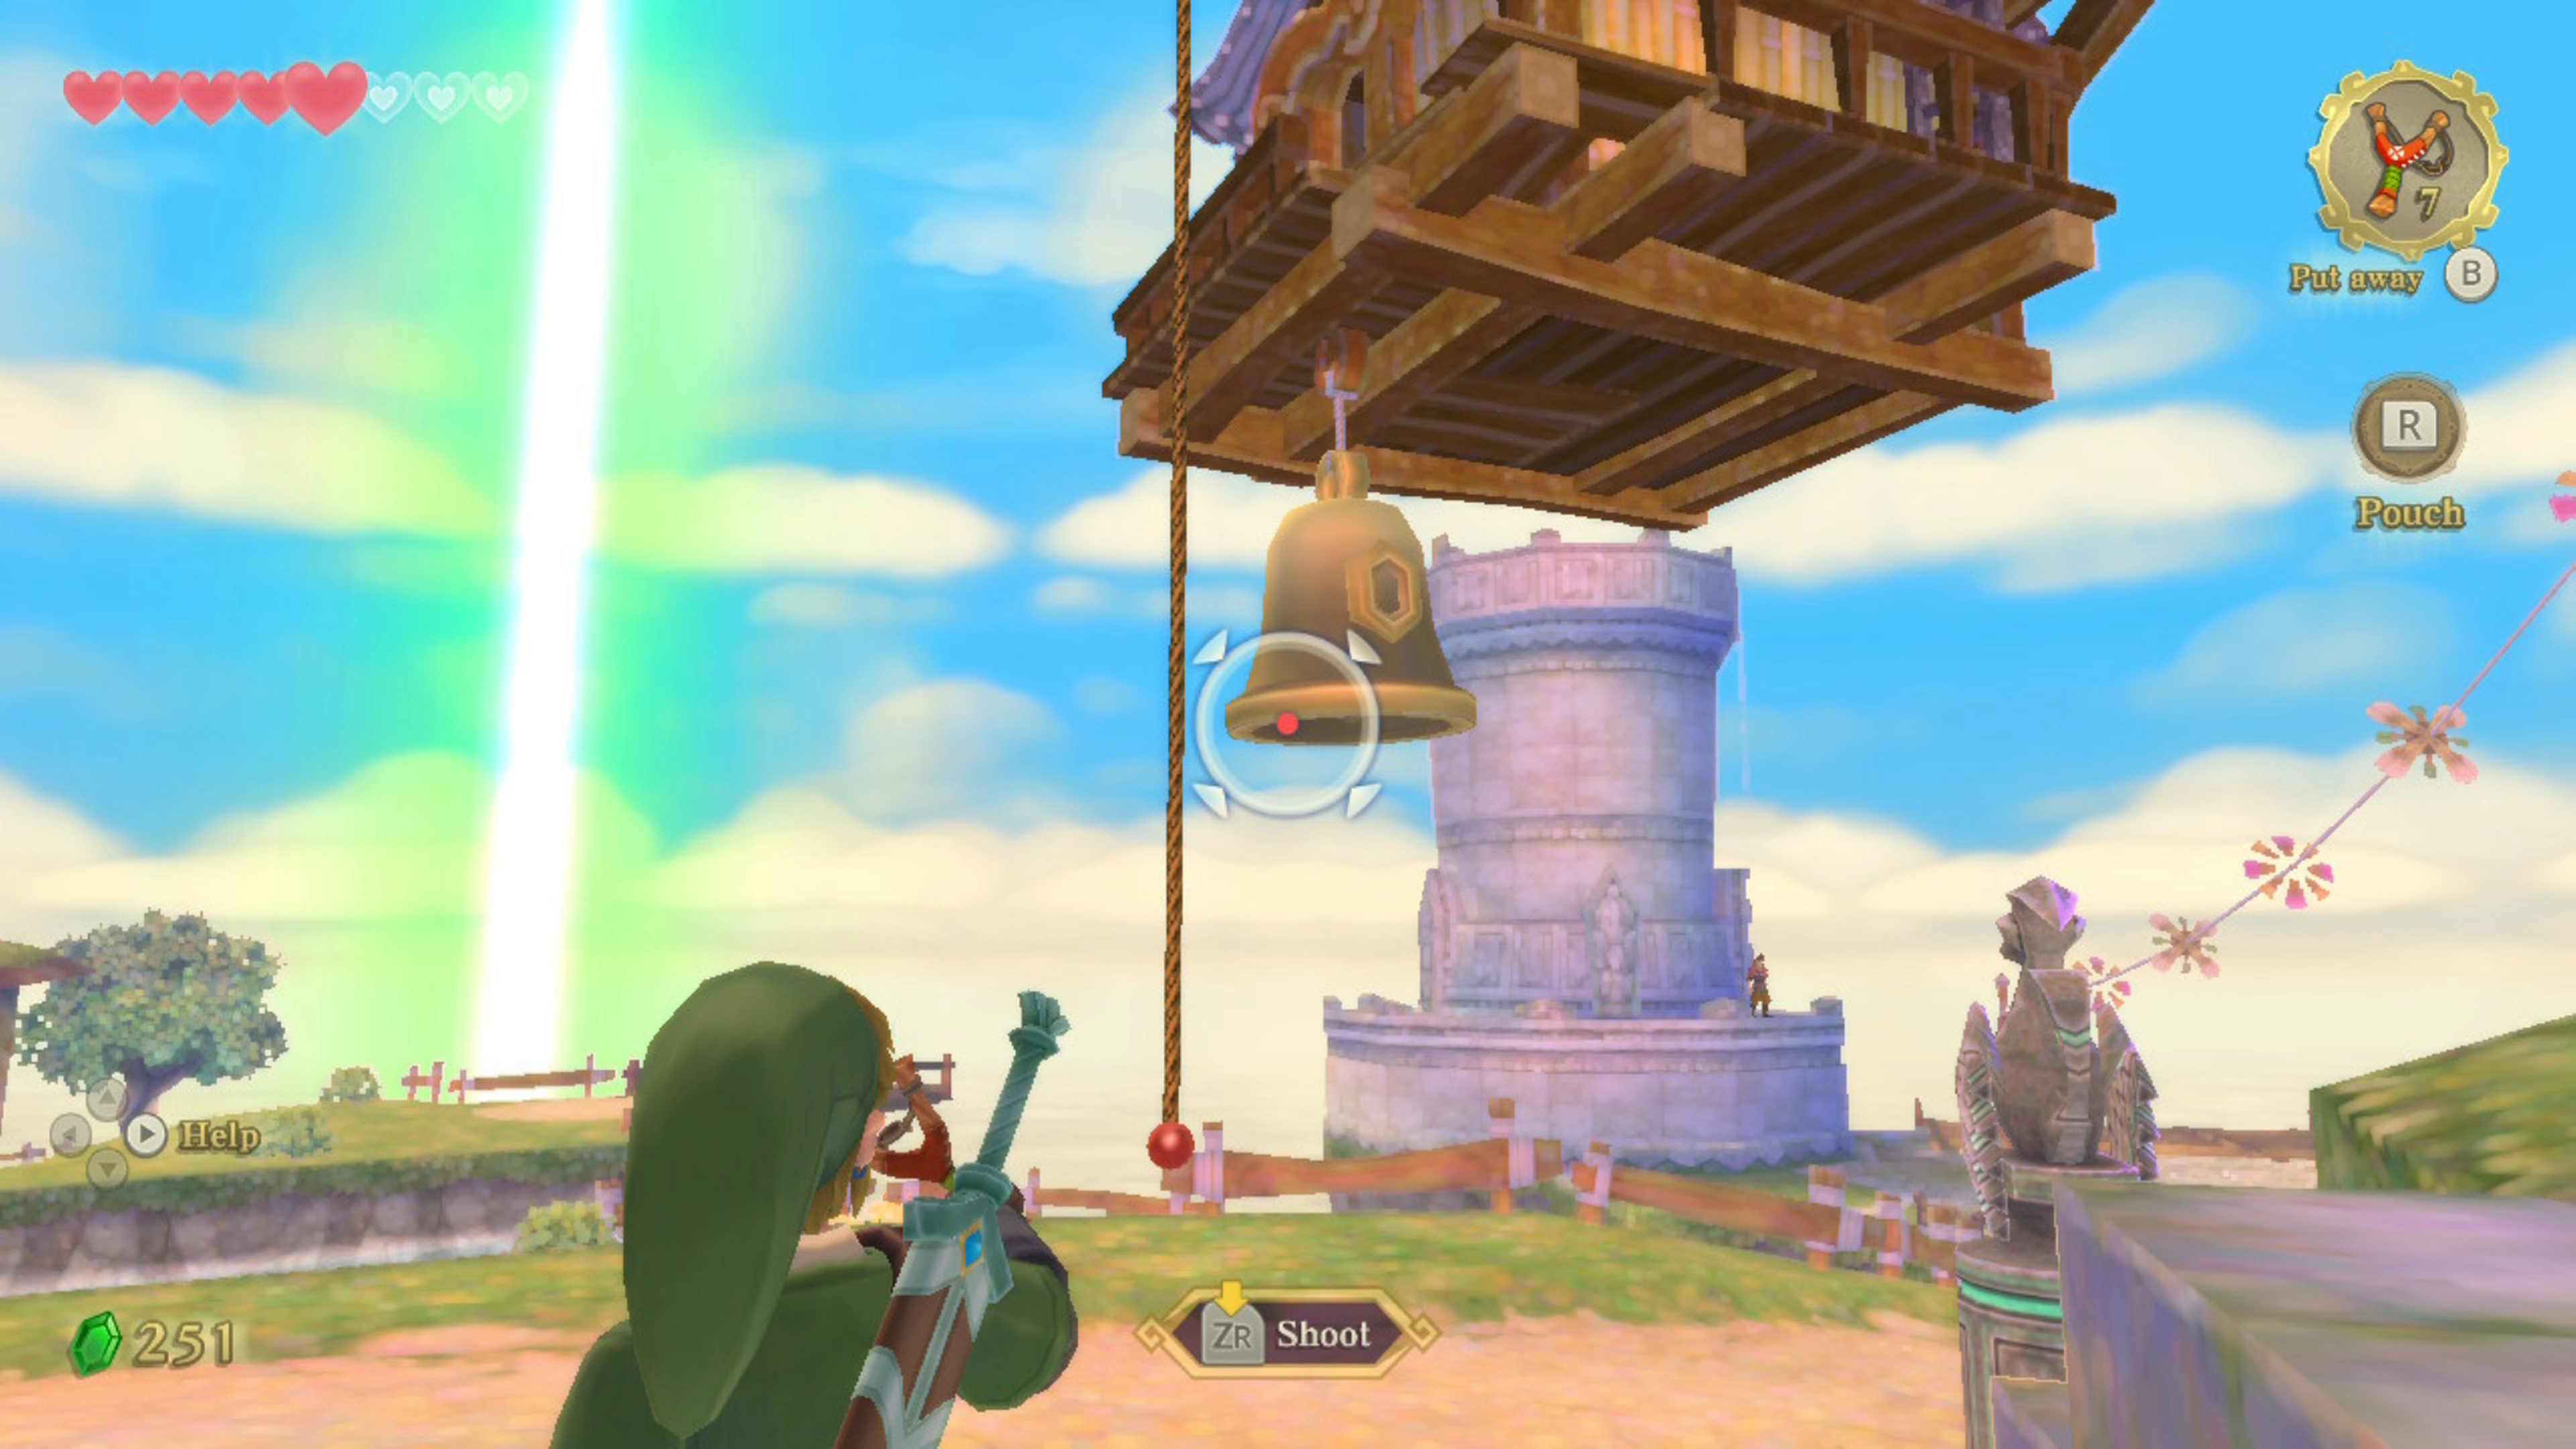 Zelda Skyward Sword: how to get to Beedle's flying shop to buy adventure pouch & wallet upgrades